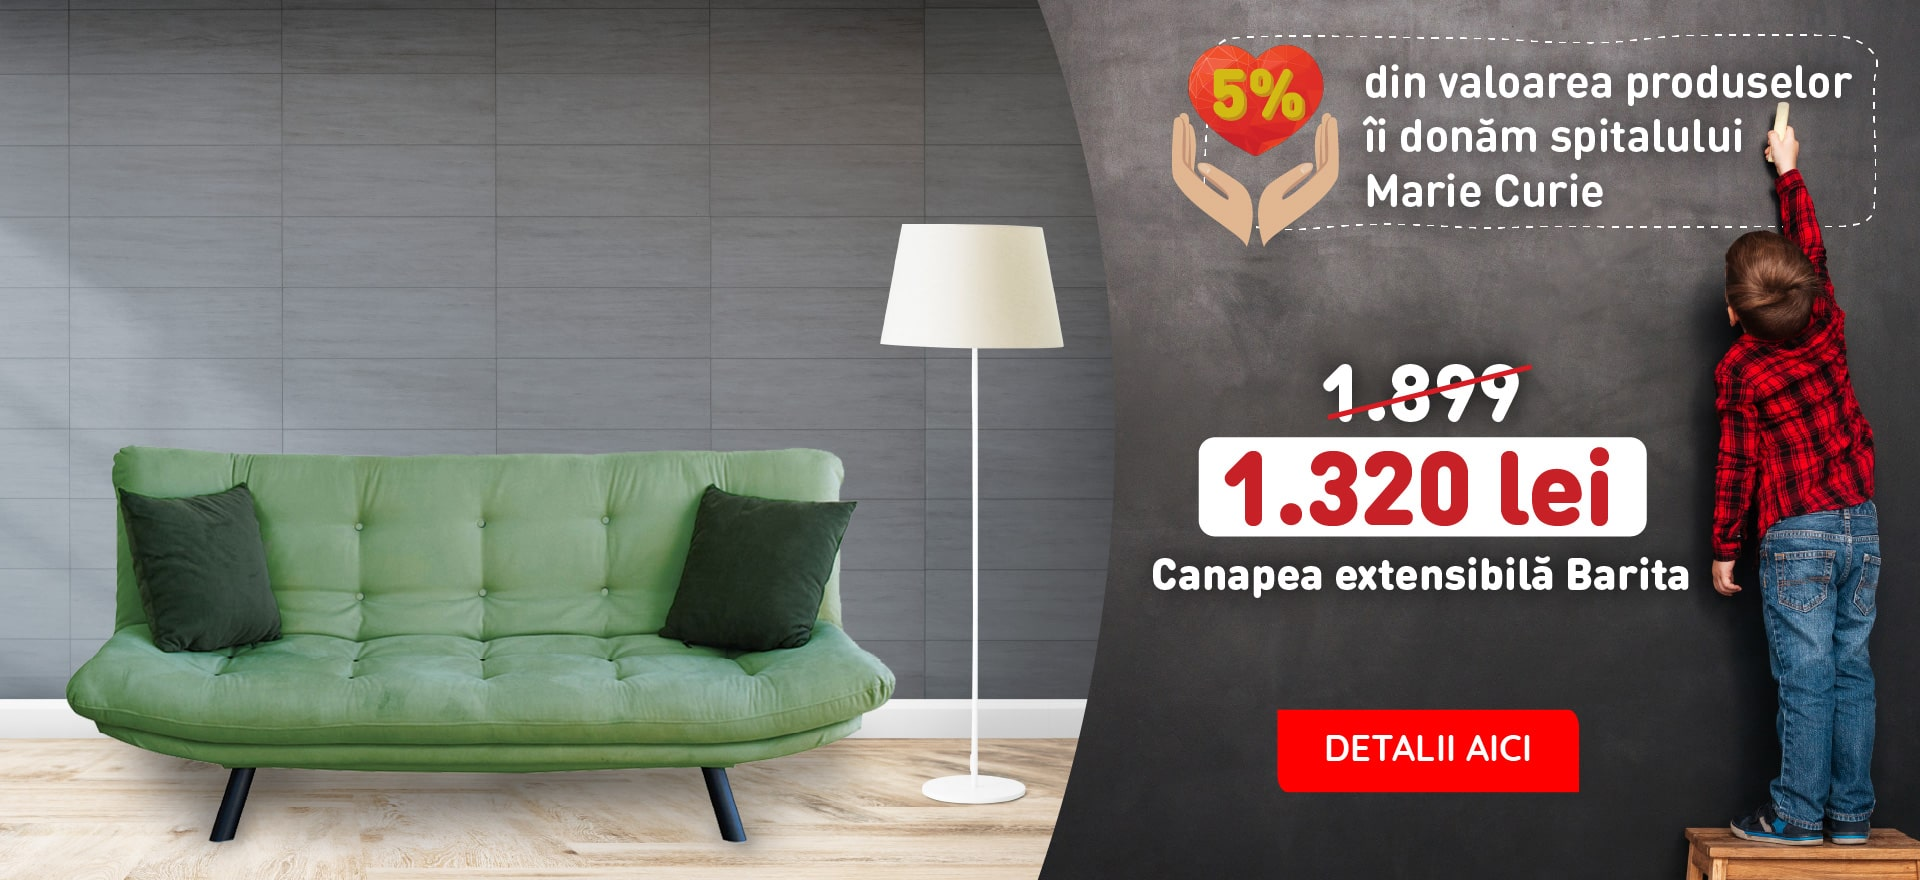 CANAPEA EXTENSIBILA BARITA,190X55X100 CM,VERDE OLIVE,TEXTIL IMPERMEABIL,CADRU OTEL